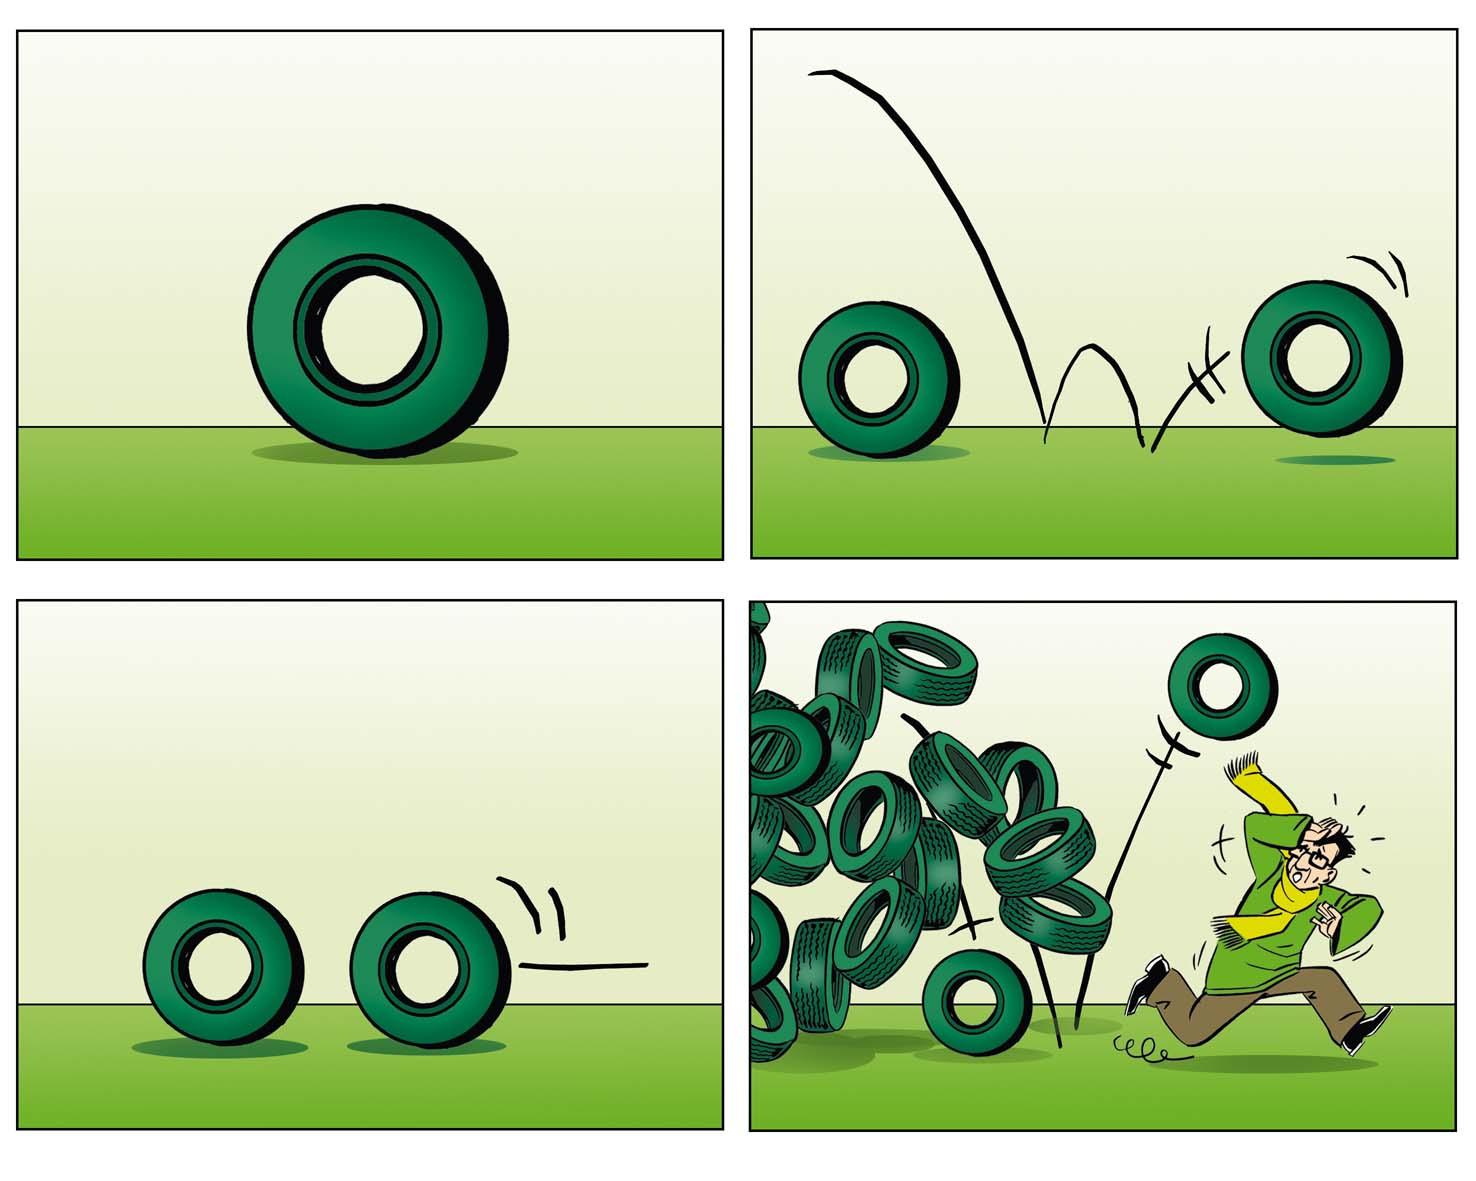 lowe pneus